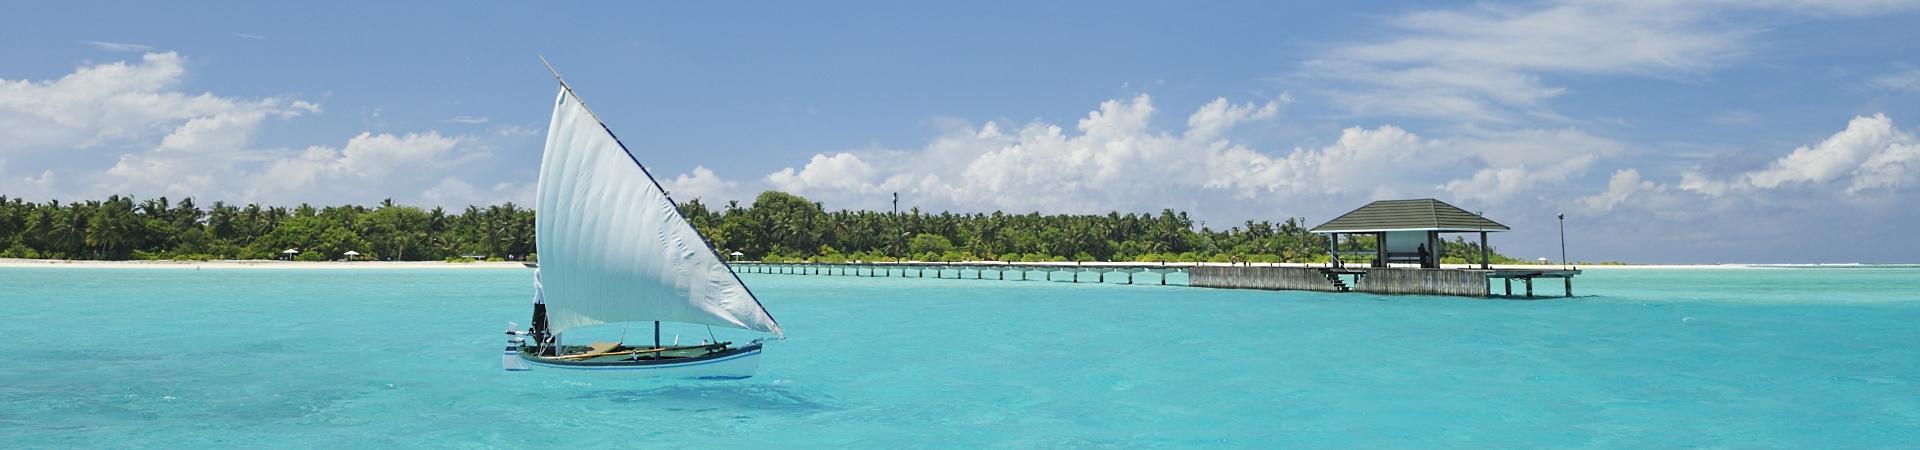 Malediven Boot